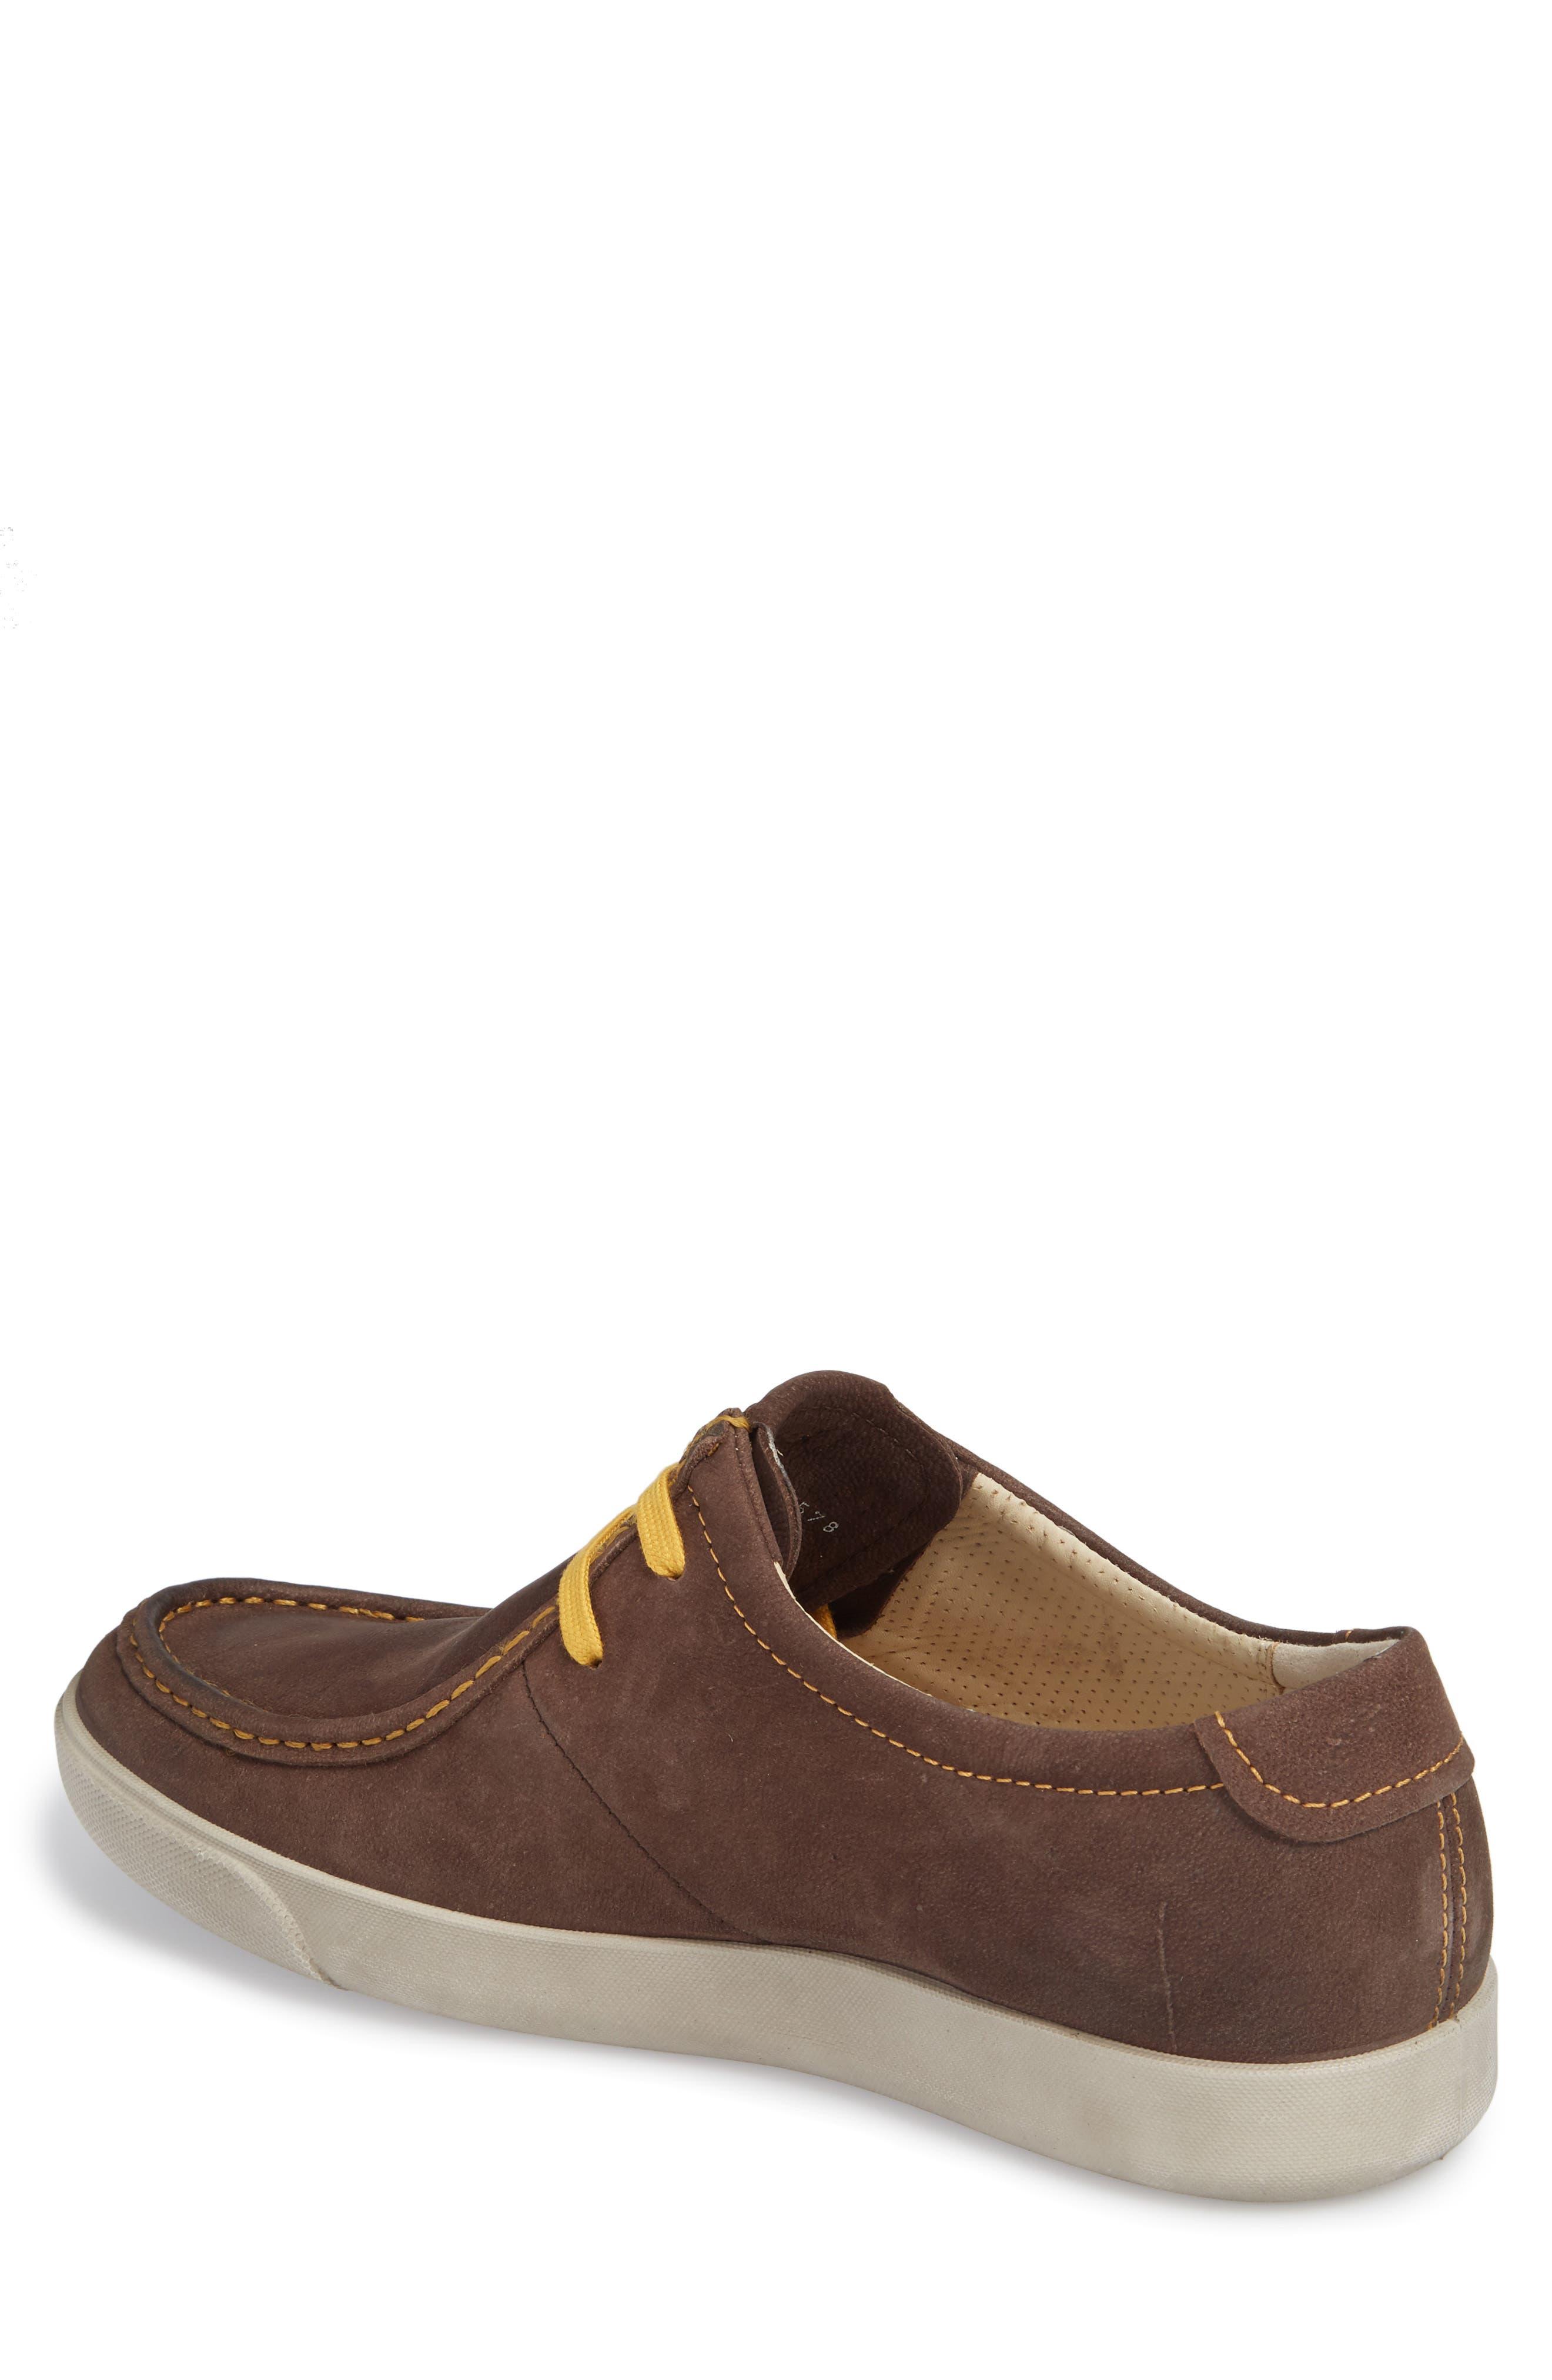 Gary Sneaker,                             Alternate thumbnail 2, color,                             Mocha Leather